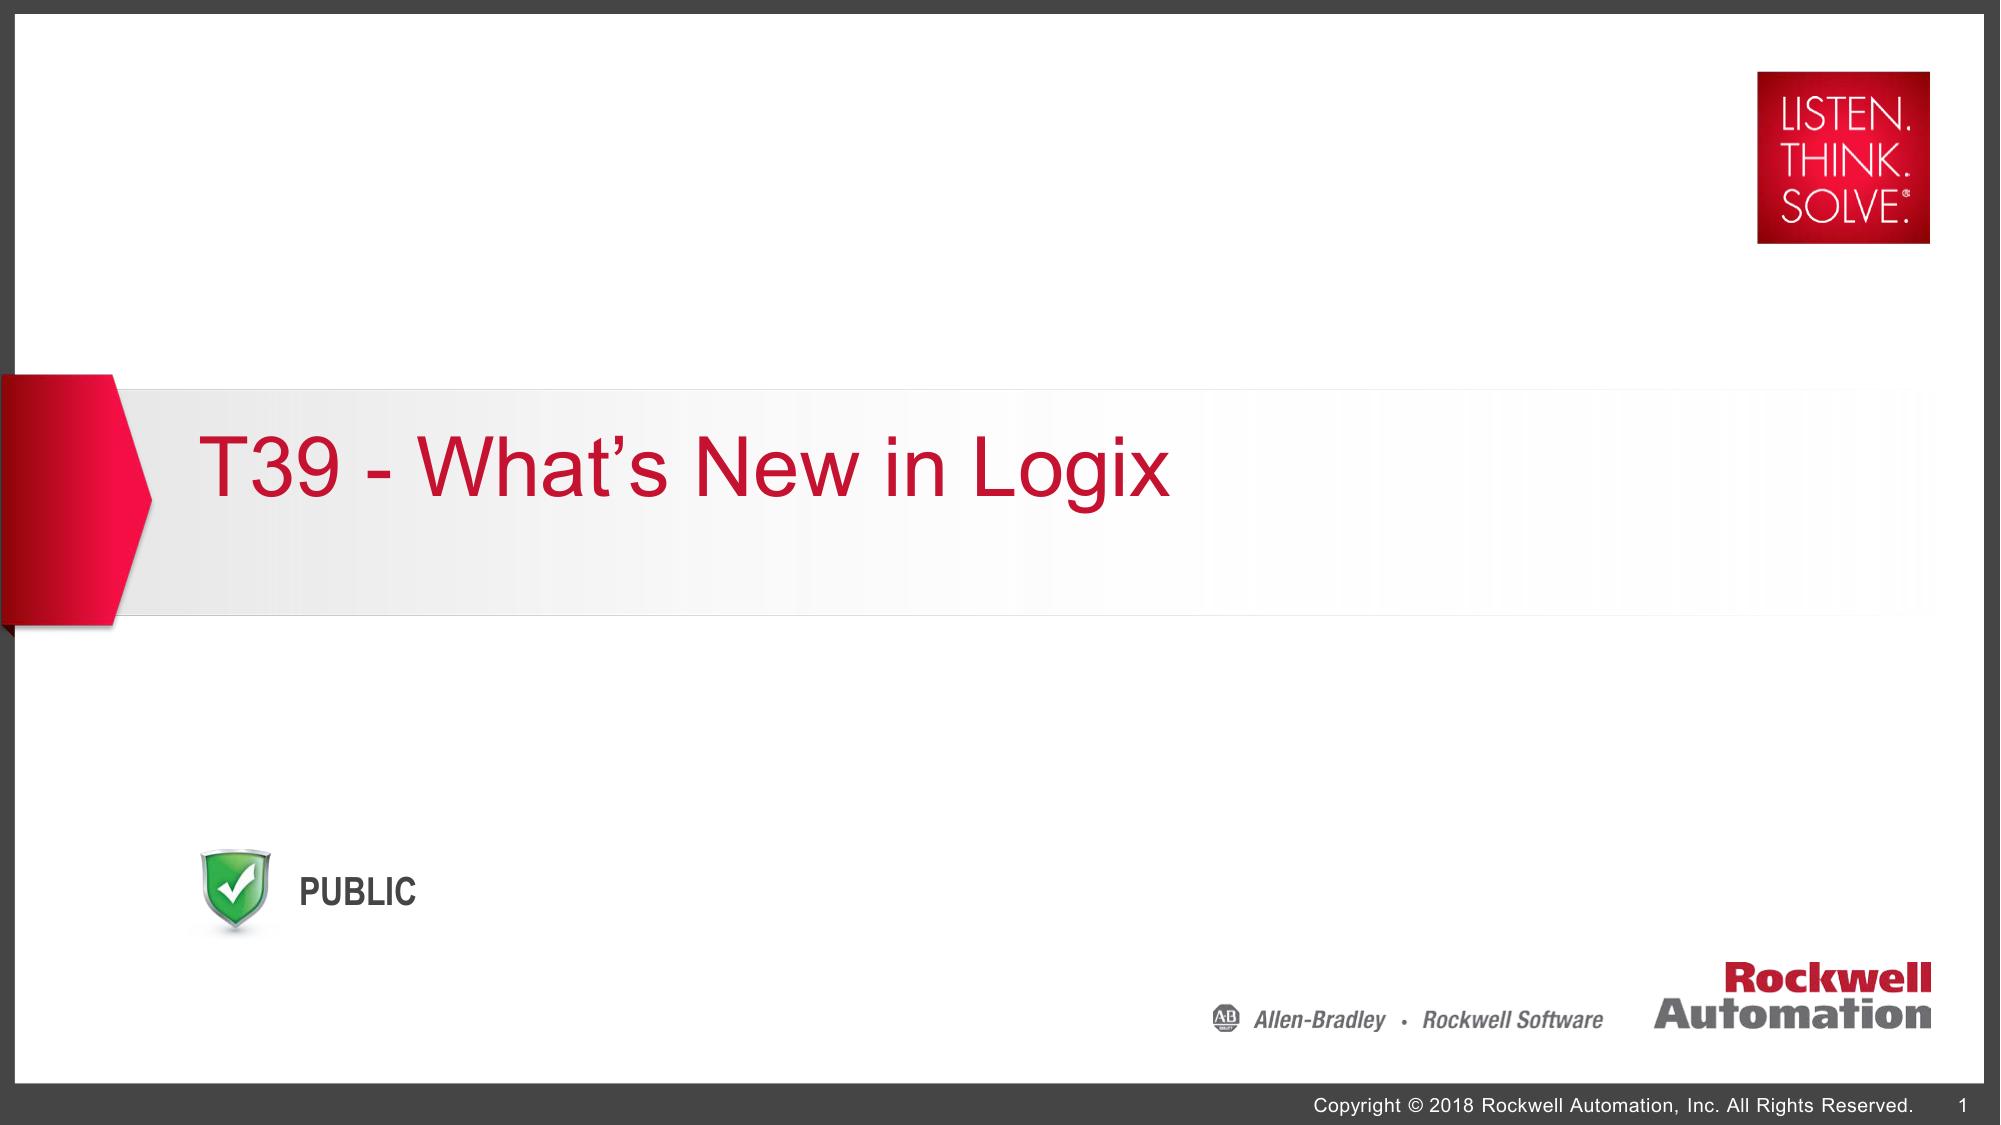 Studio 5000 logix emulate v31 | Studio 5000 Versioning and Firmware